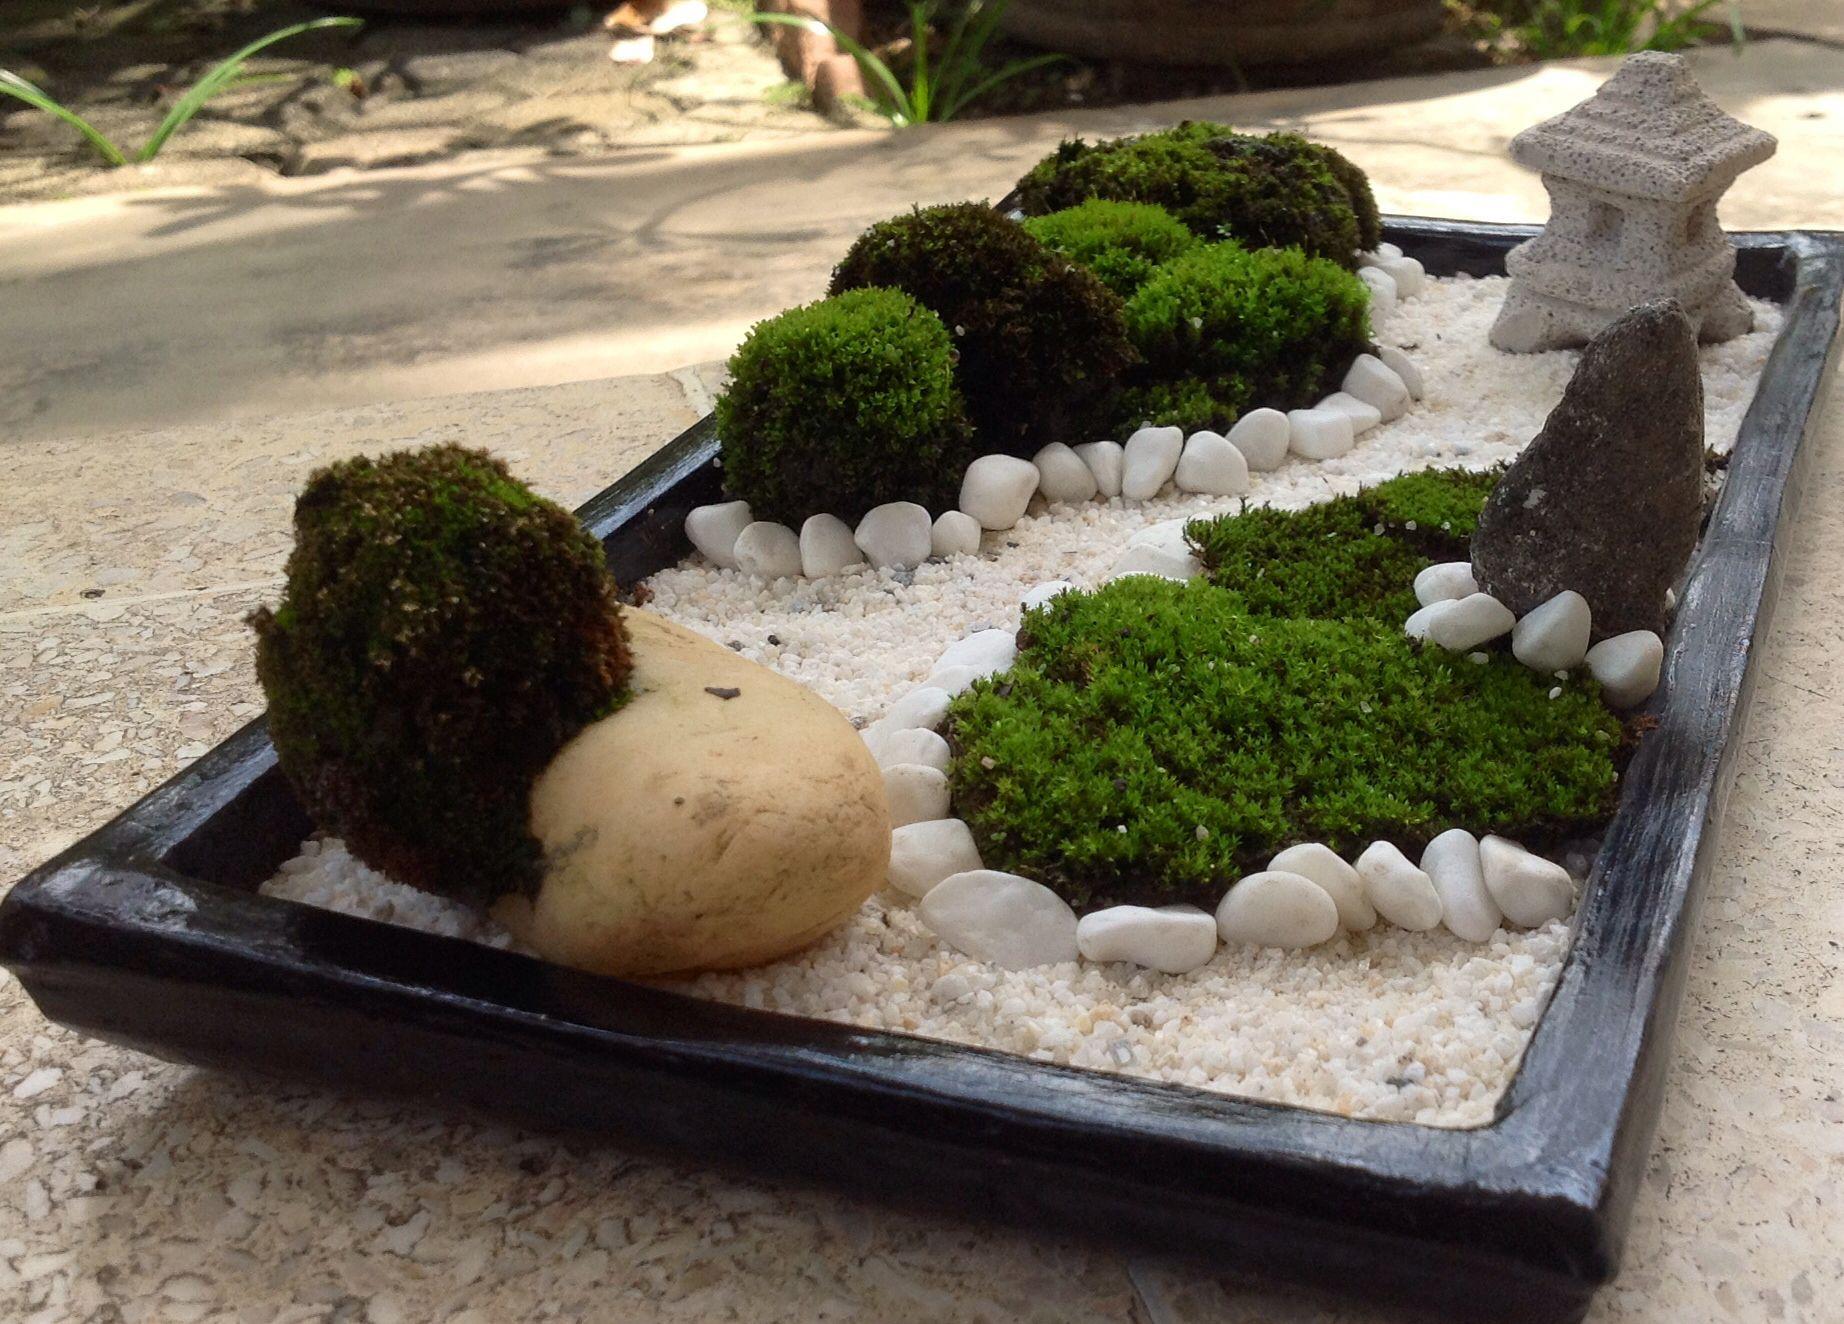 moss on the white stone mini zen garden pinterest white stone mini zen garden and gardens. Black Bedroom Furniture Sets. Home Design Ideas